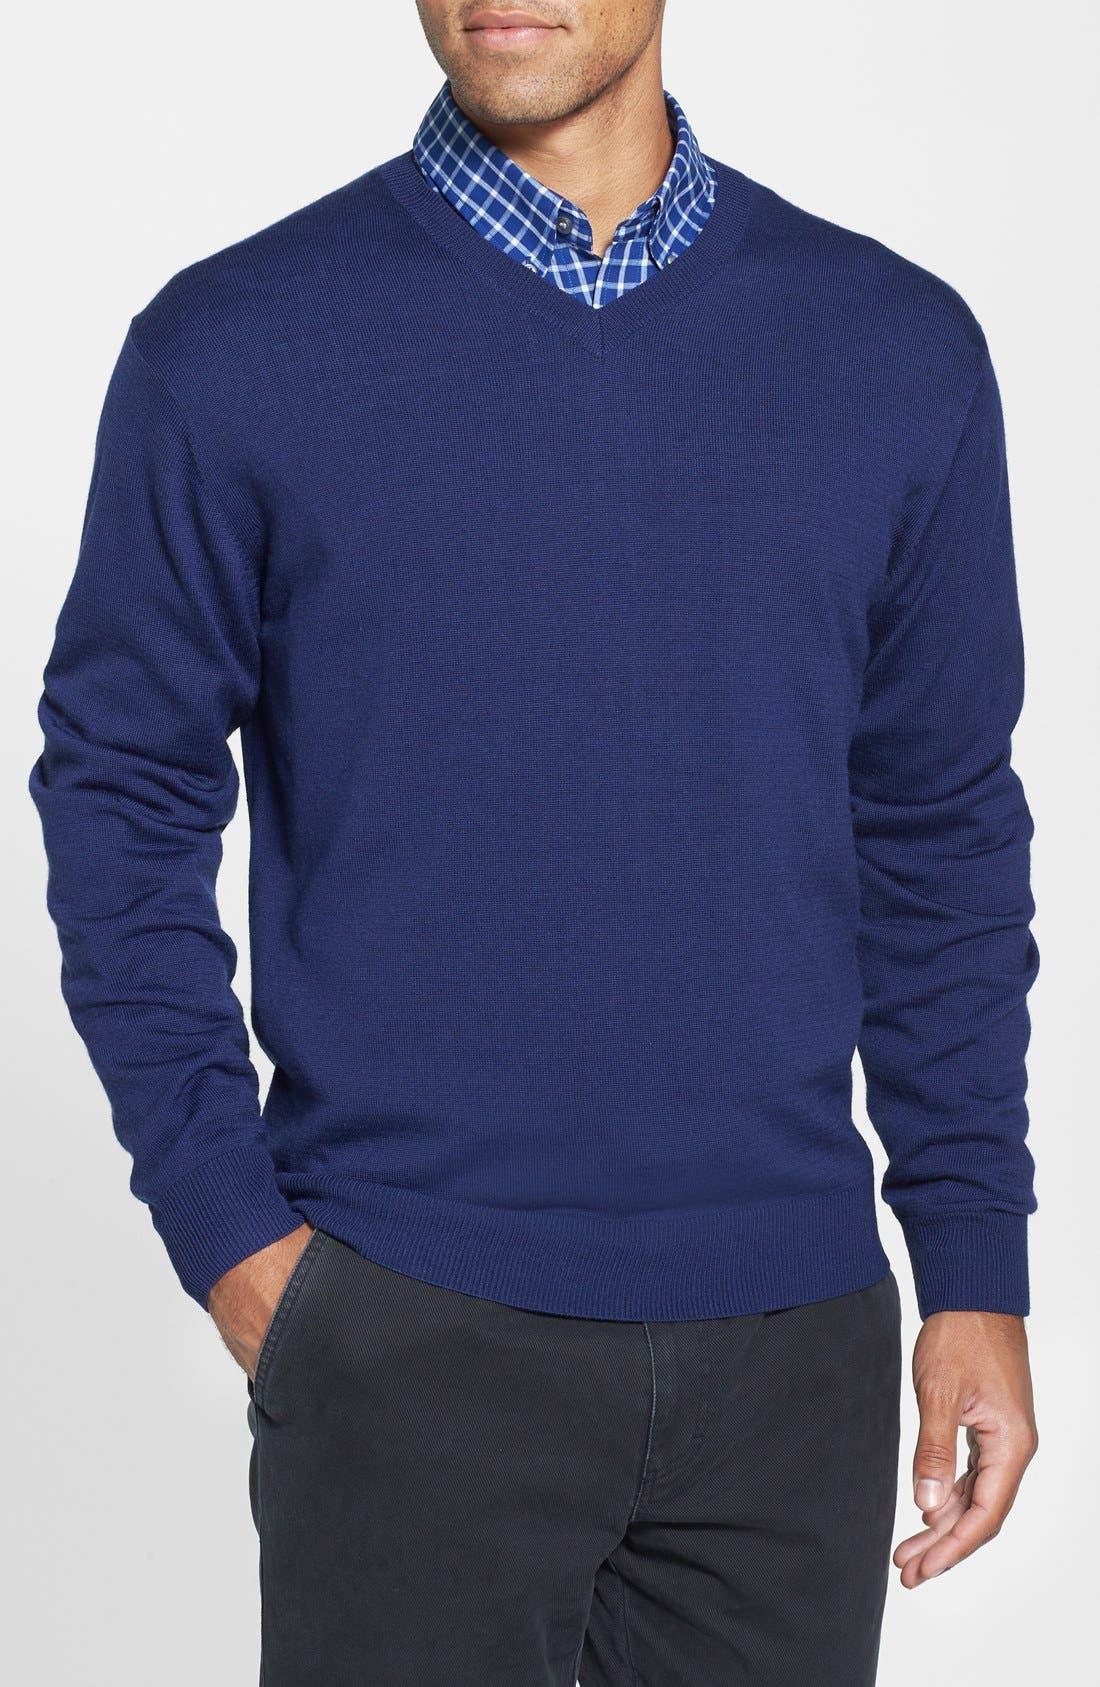 Douglas V-Neck Sweater,                         Main,                         color, Liberty Navy